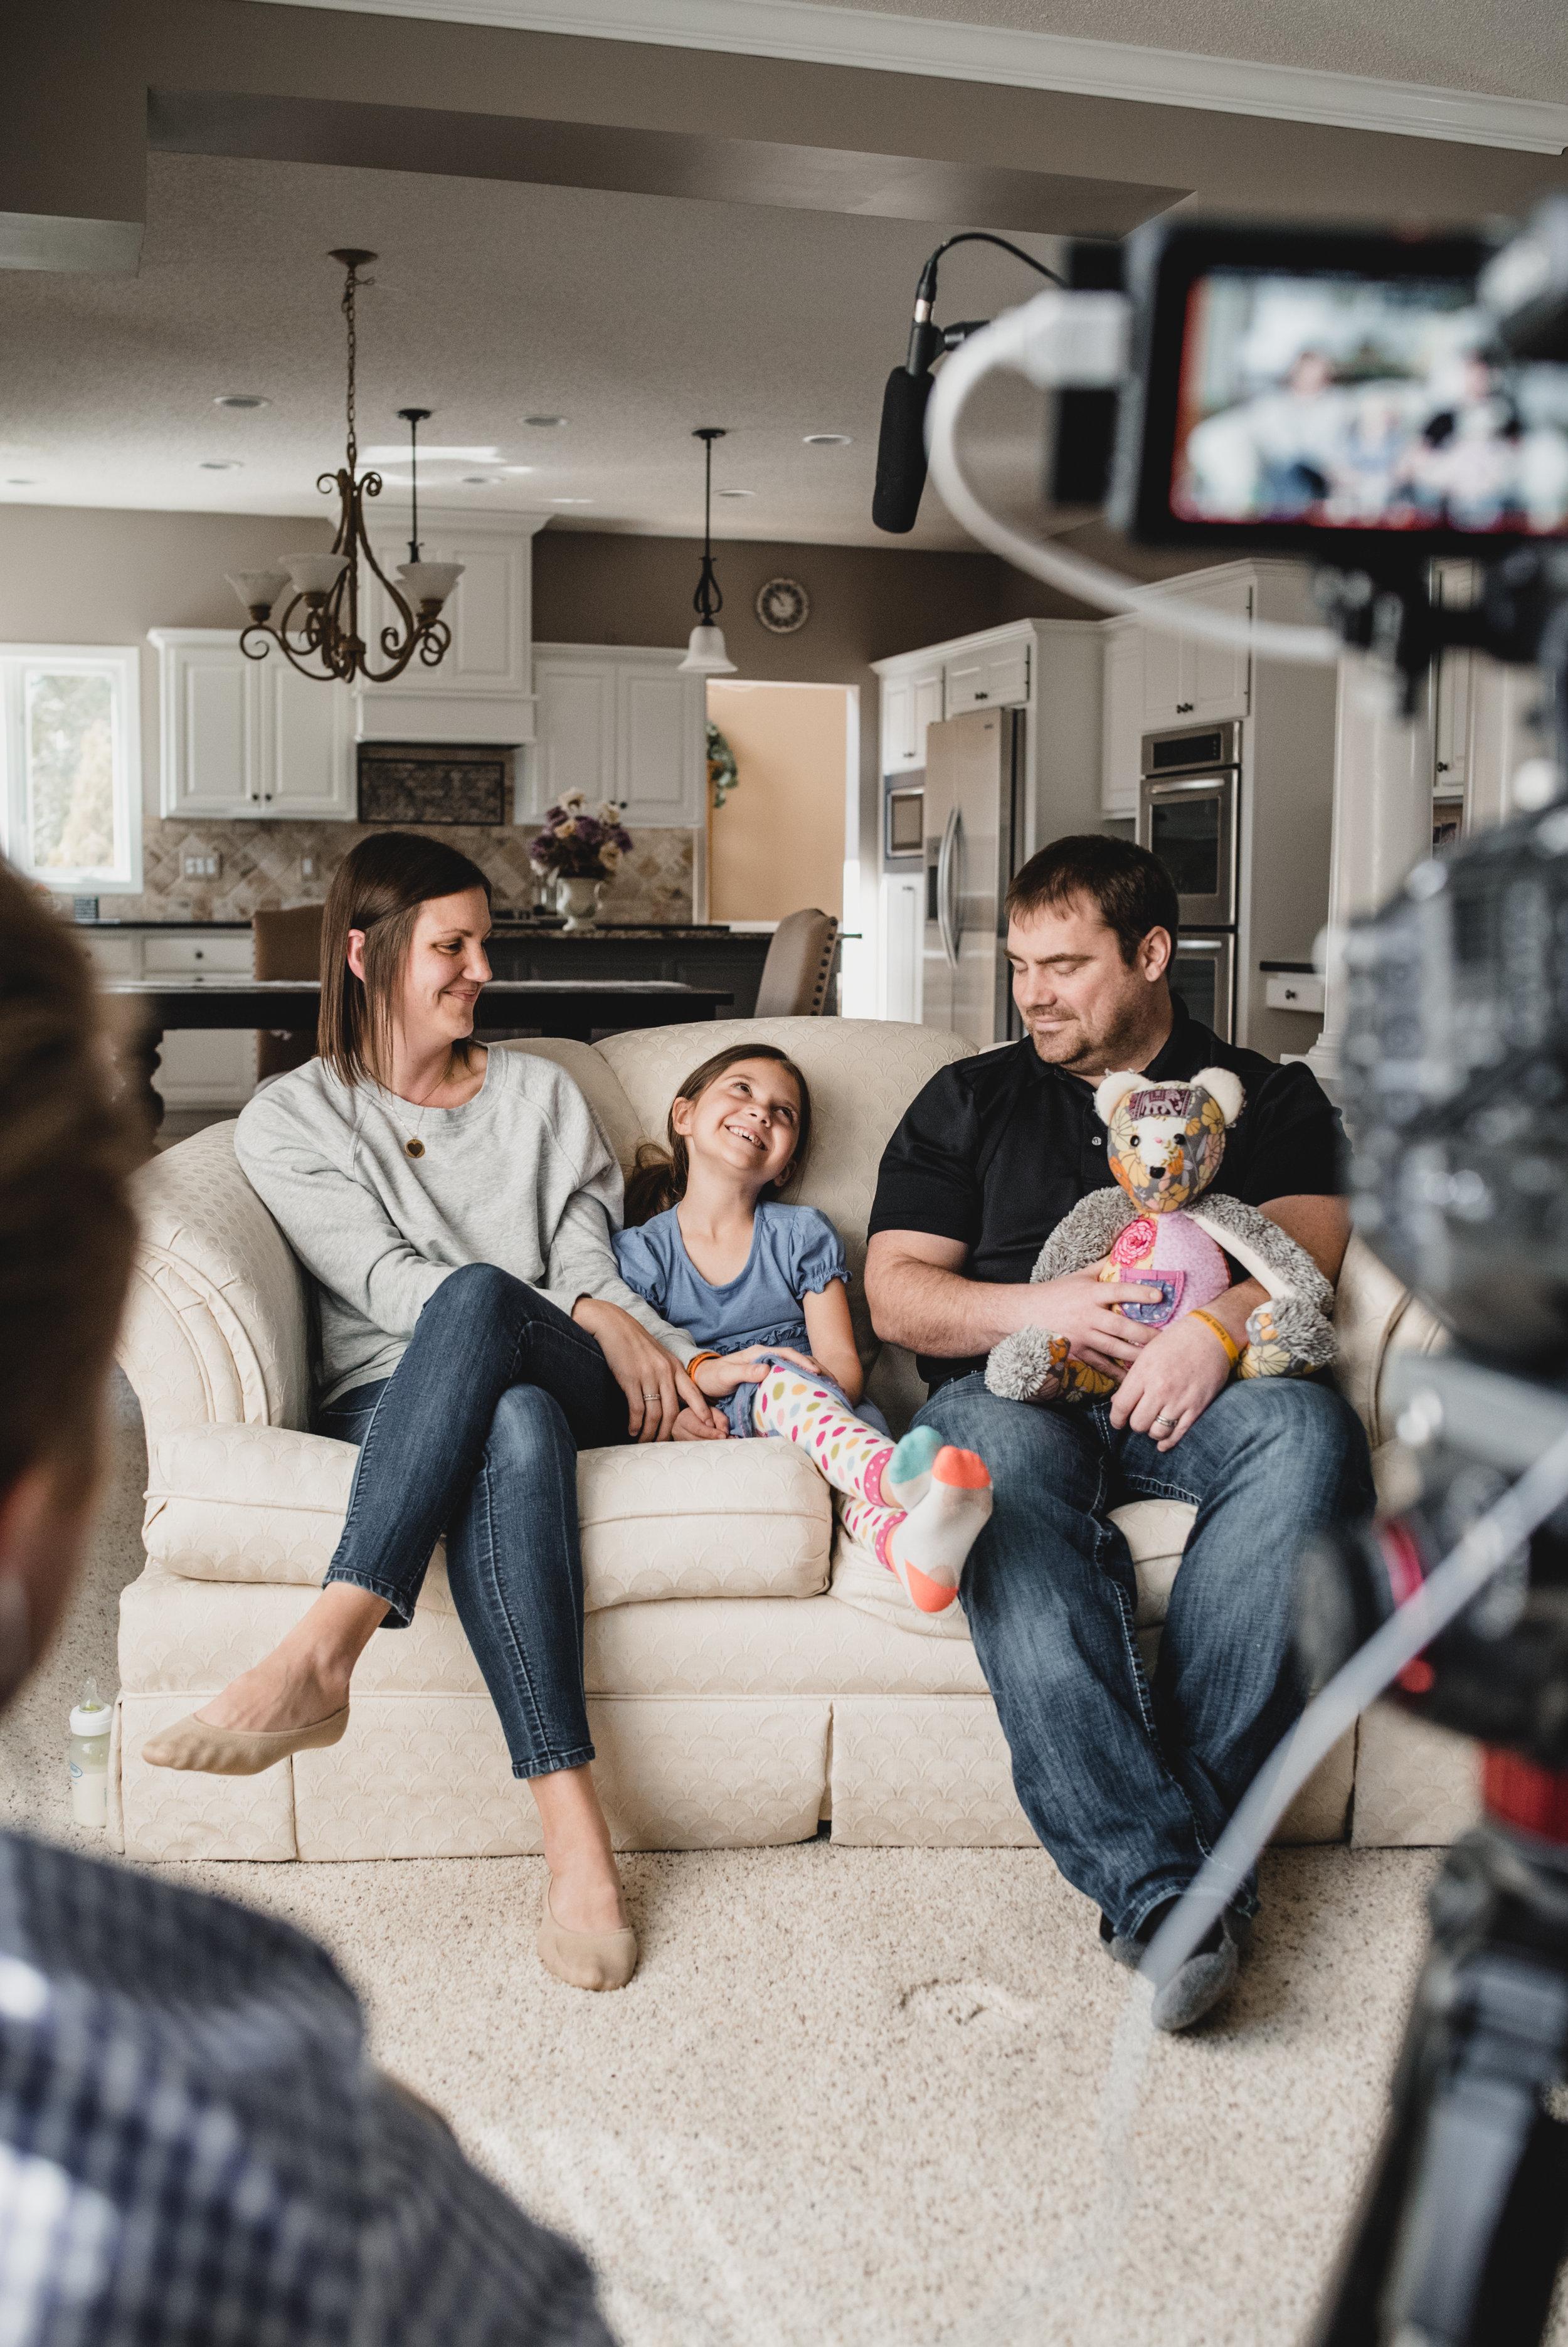 acowsay-cinema-LLS-2019-Breyfogle-Family- (32 of 51).jpg